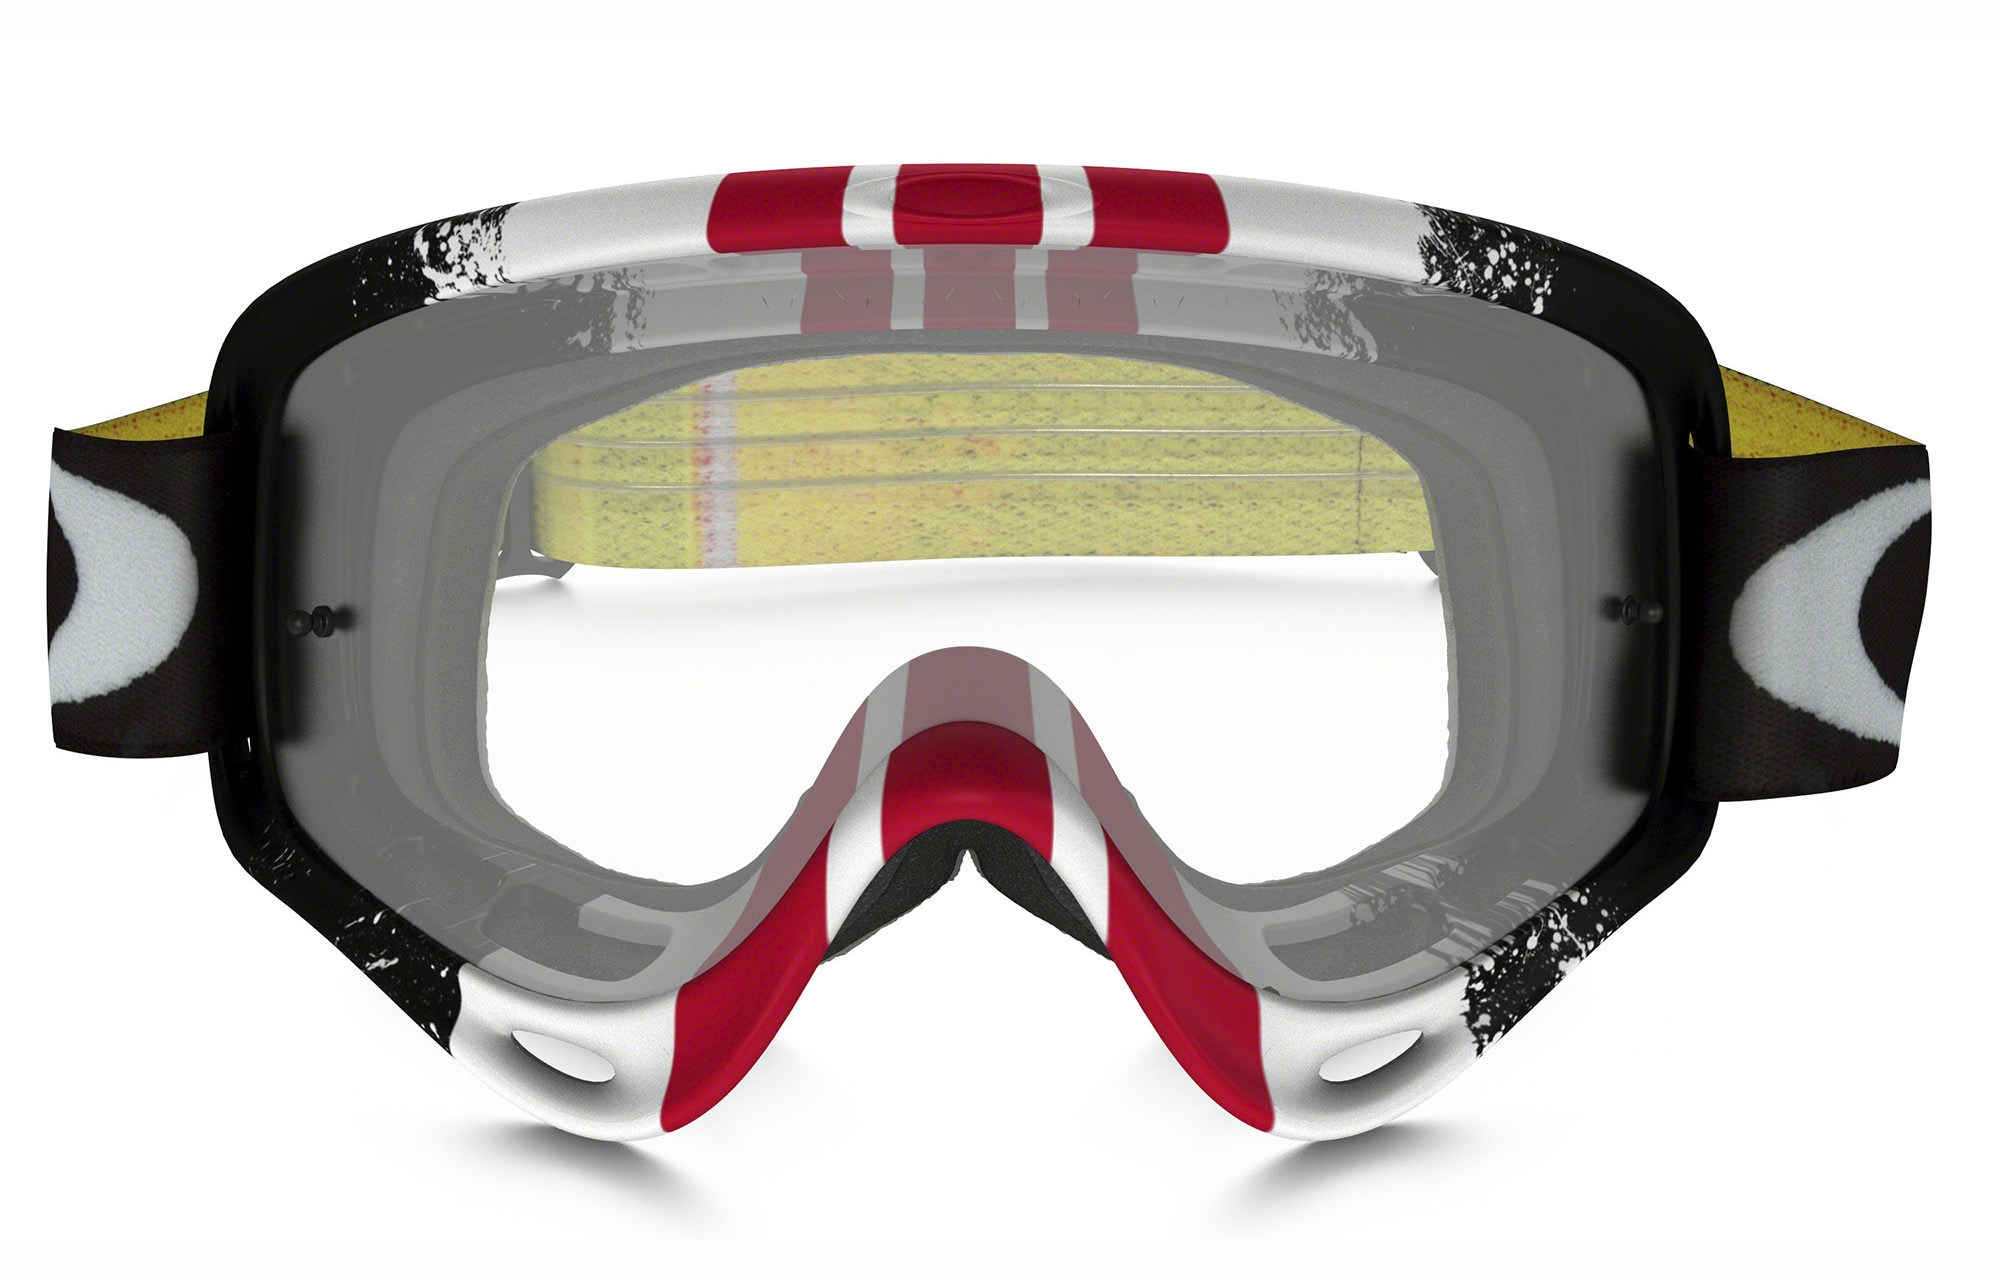 oakley o frame mx pinned race redwhiteblack goggles clear lens